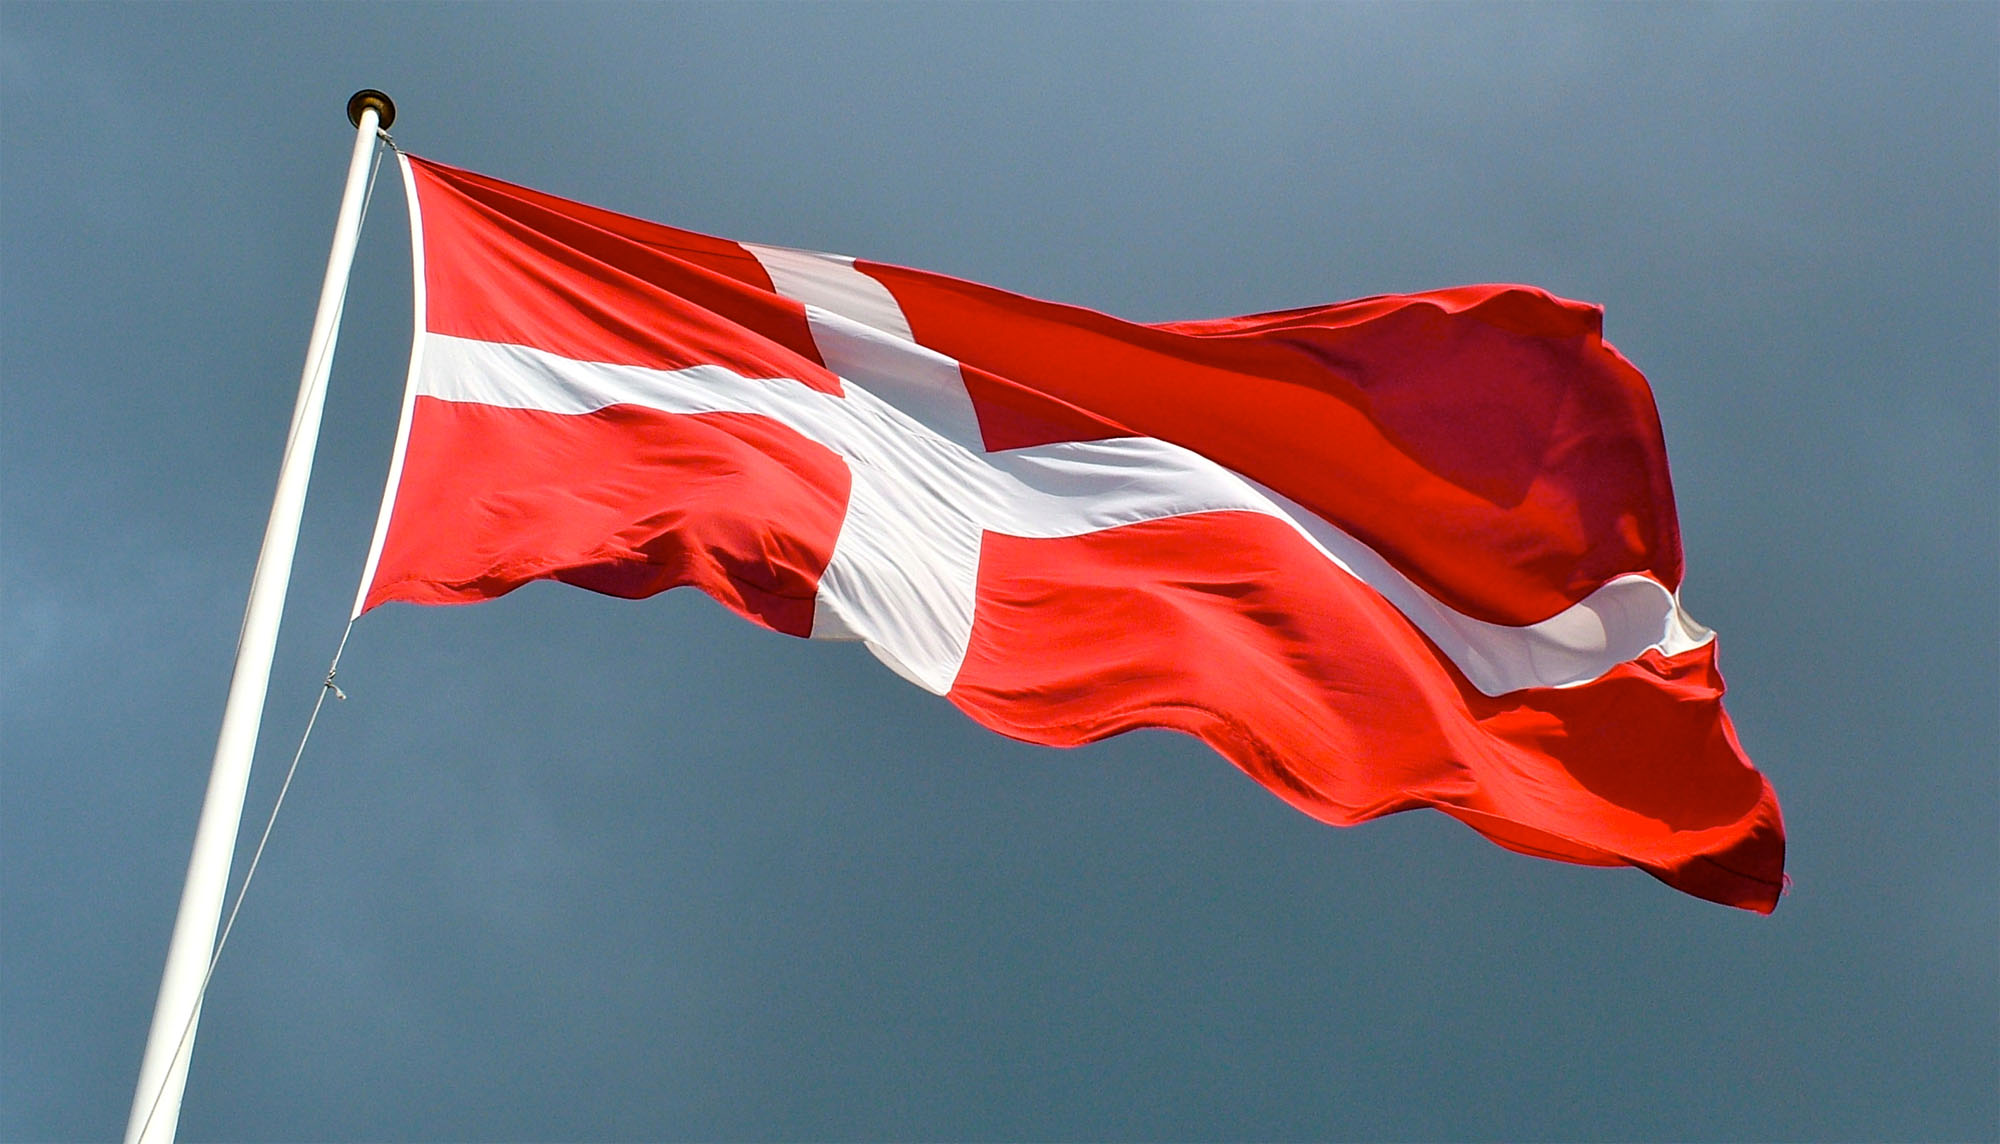 Svenska E-handlare öppnar gärna butik i Danmark